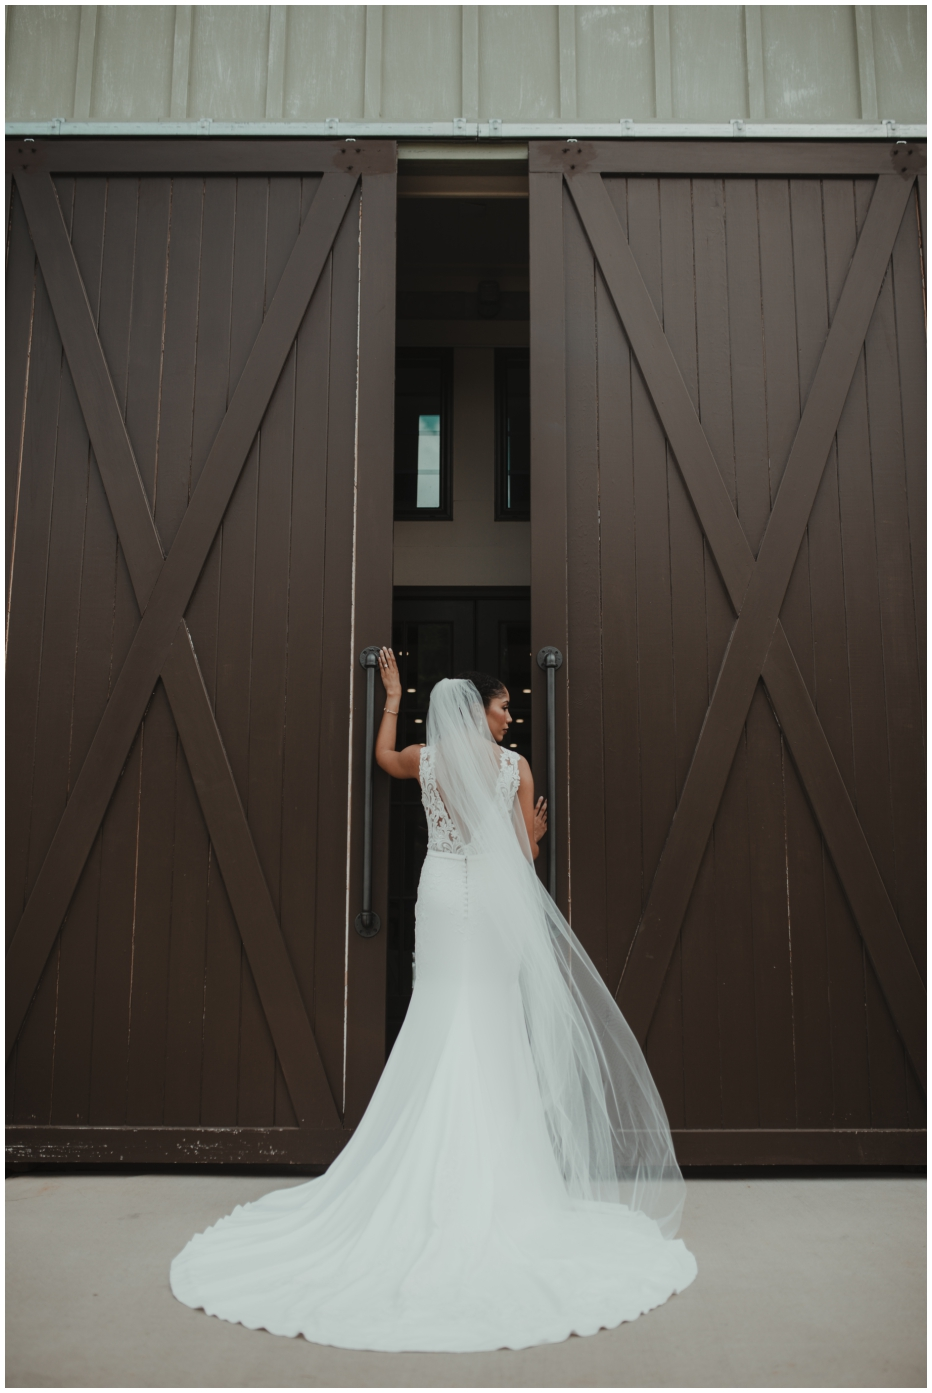 Posh-Moments-Photography-NC- Wedding-Photographer-Rolling-Hills-Farms-Wedding-Monroe-NC-Charlotte-NC_0249.jpg